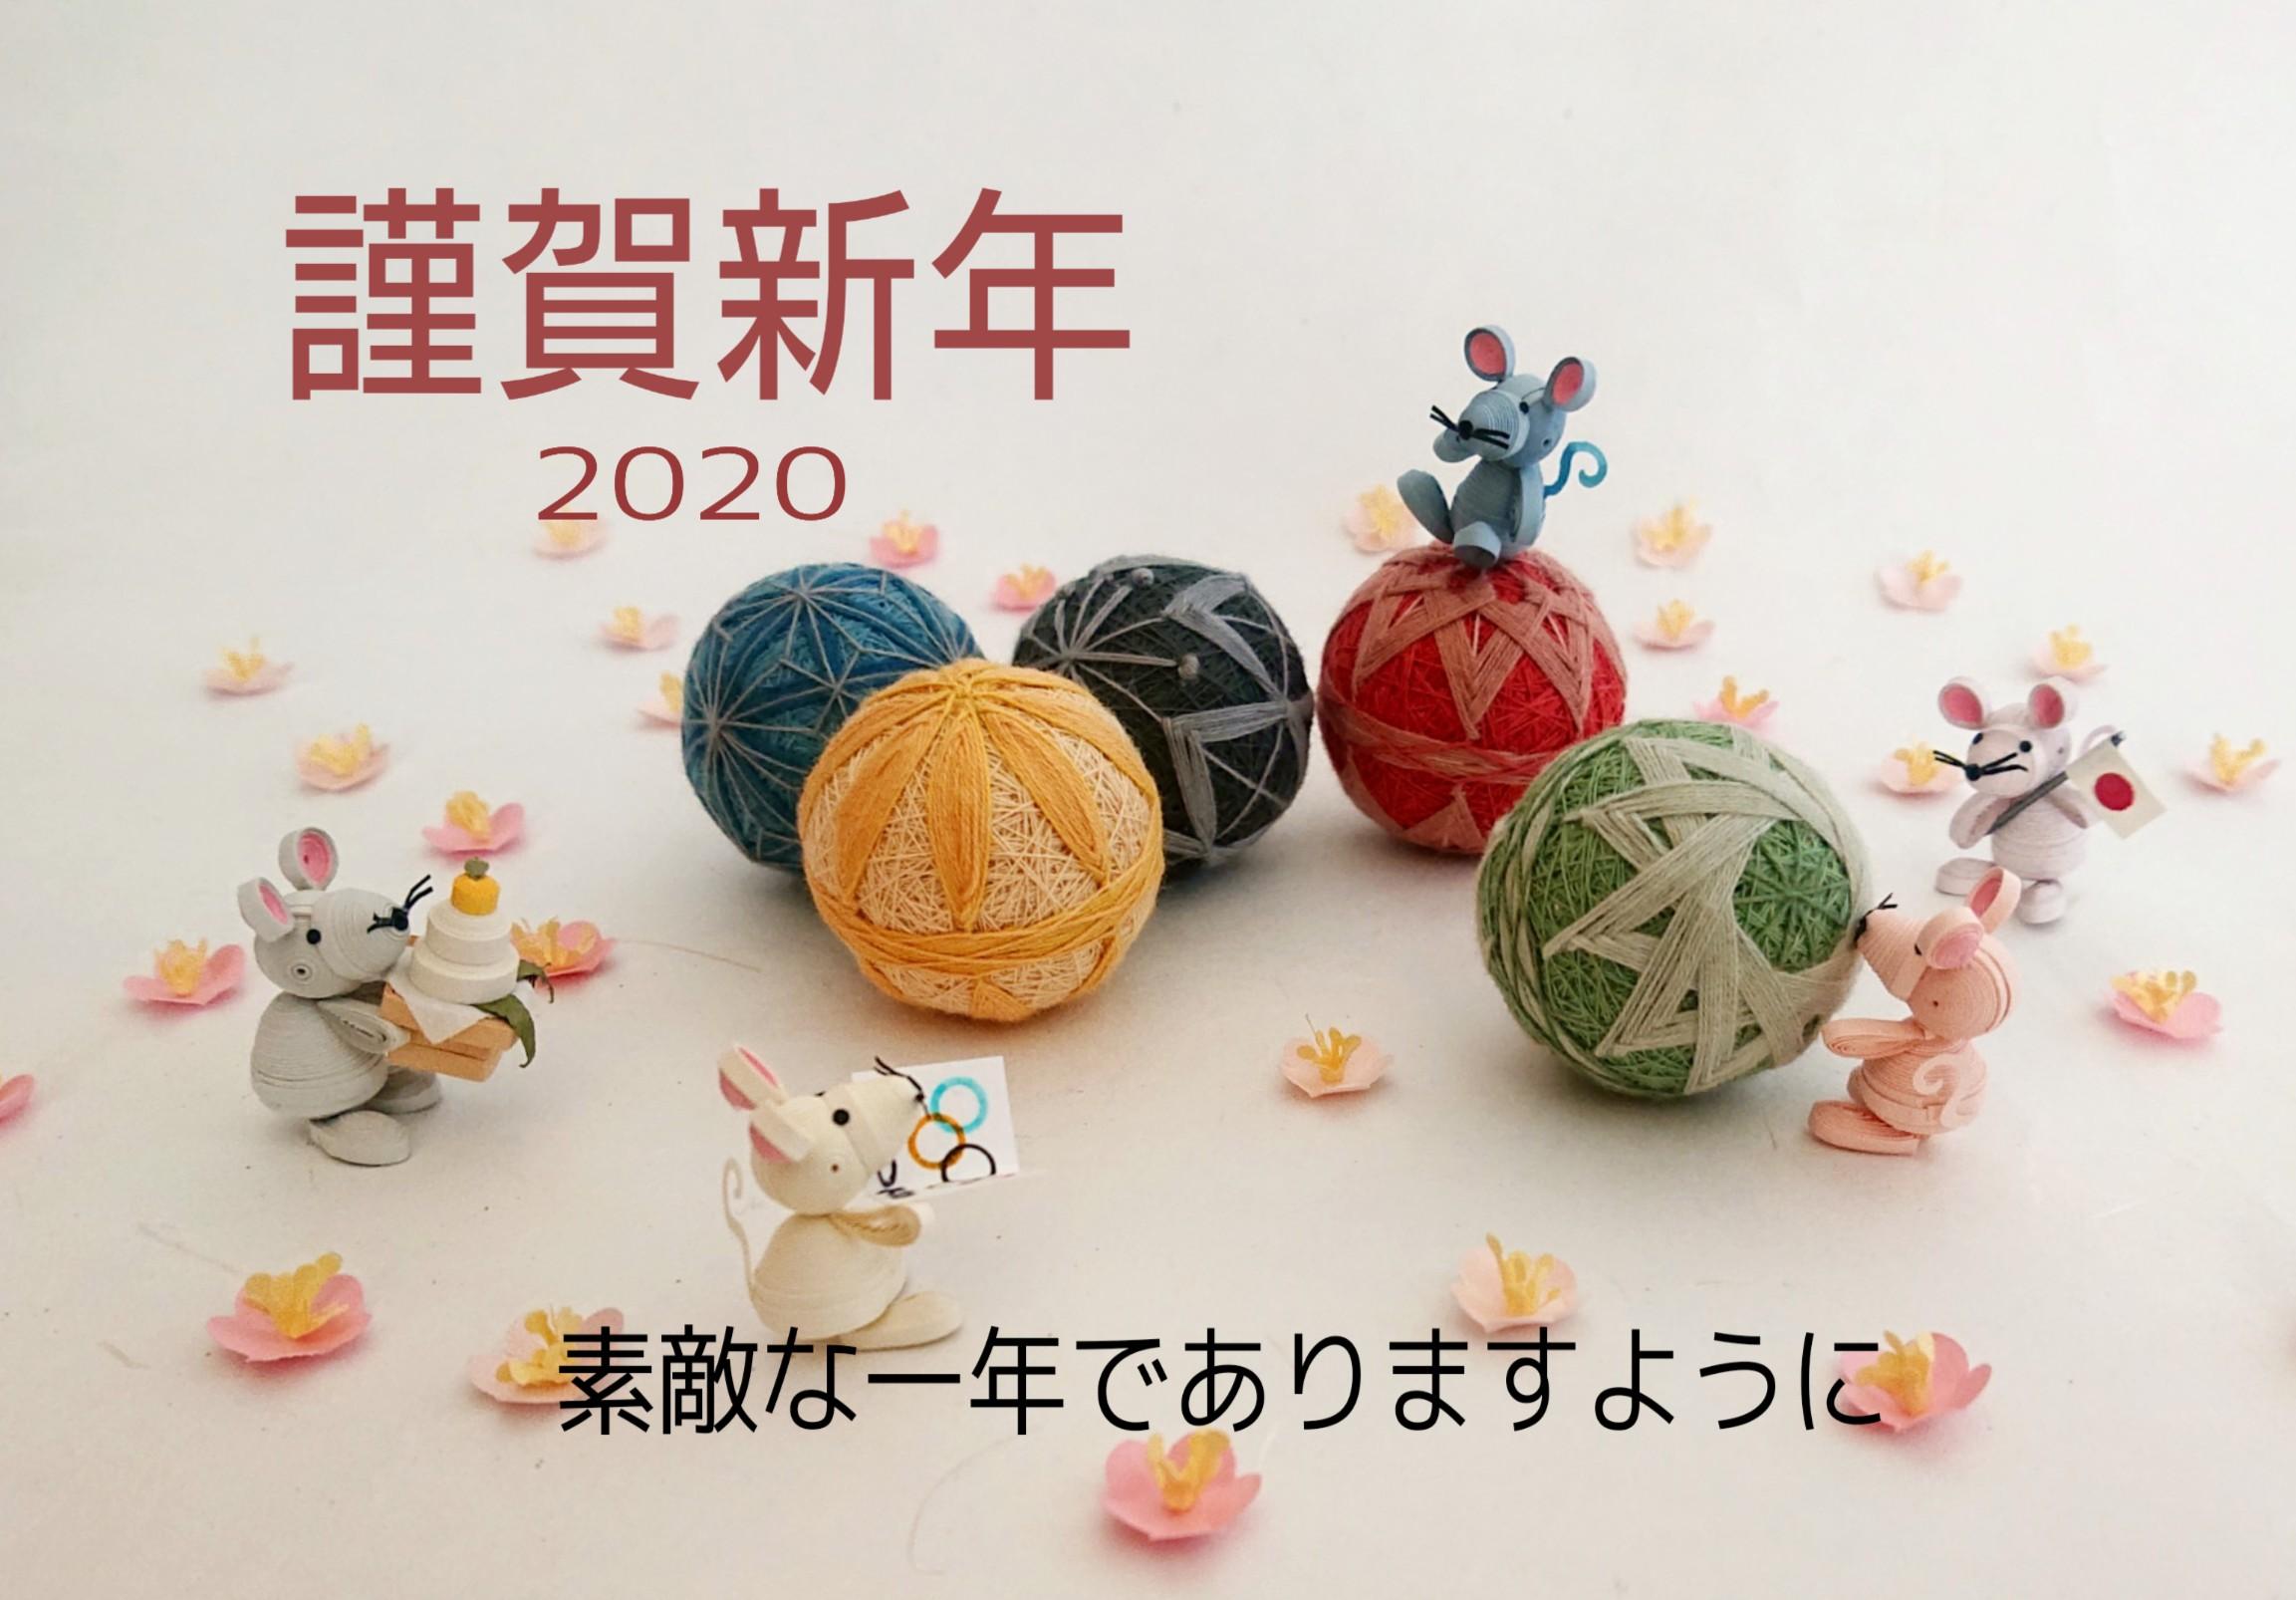 202001022325105a6.jpg